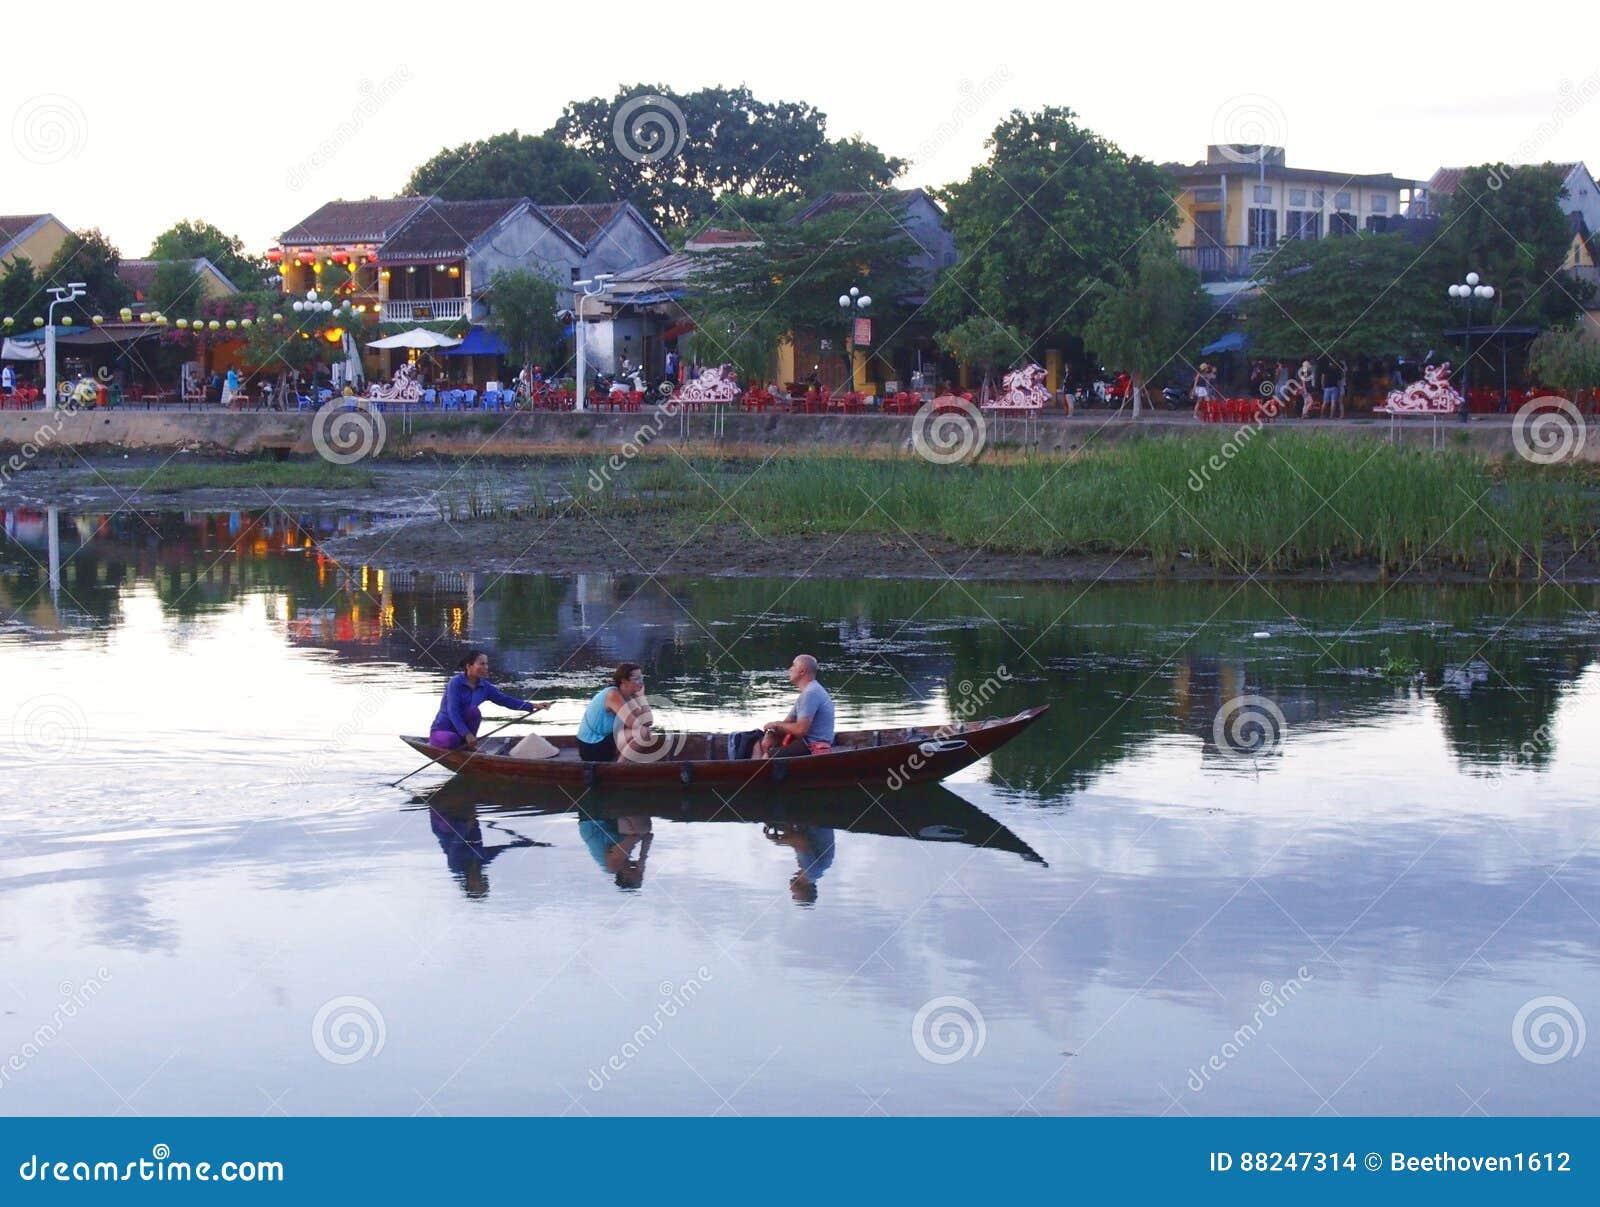 Hoi παλαιοί δημαρχεία και ποταμός στο Βιετνάμ